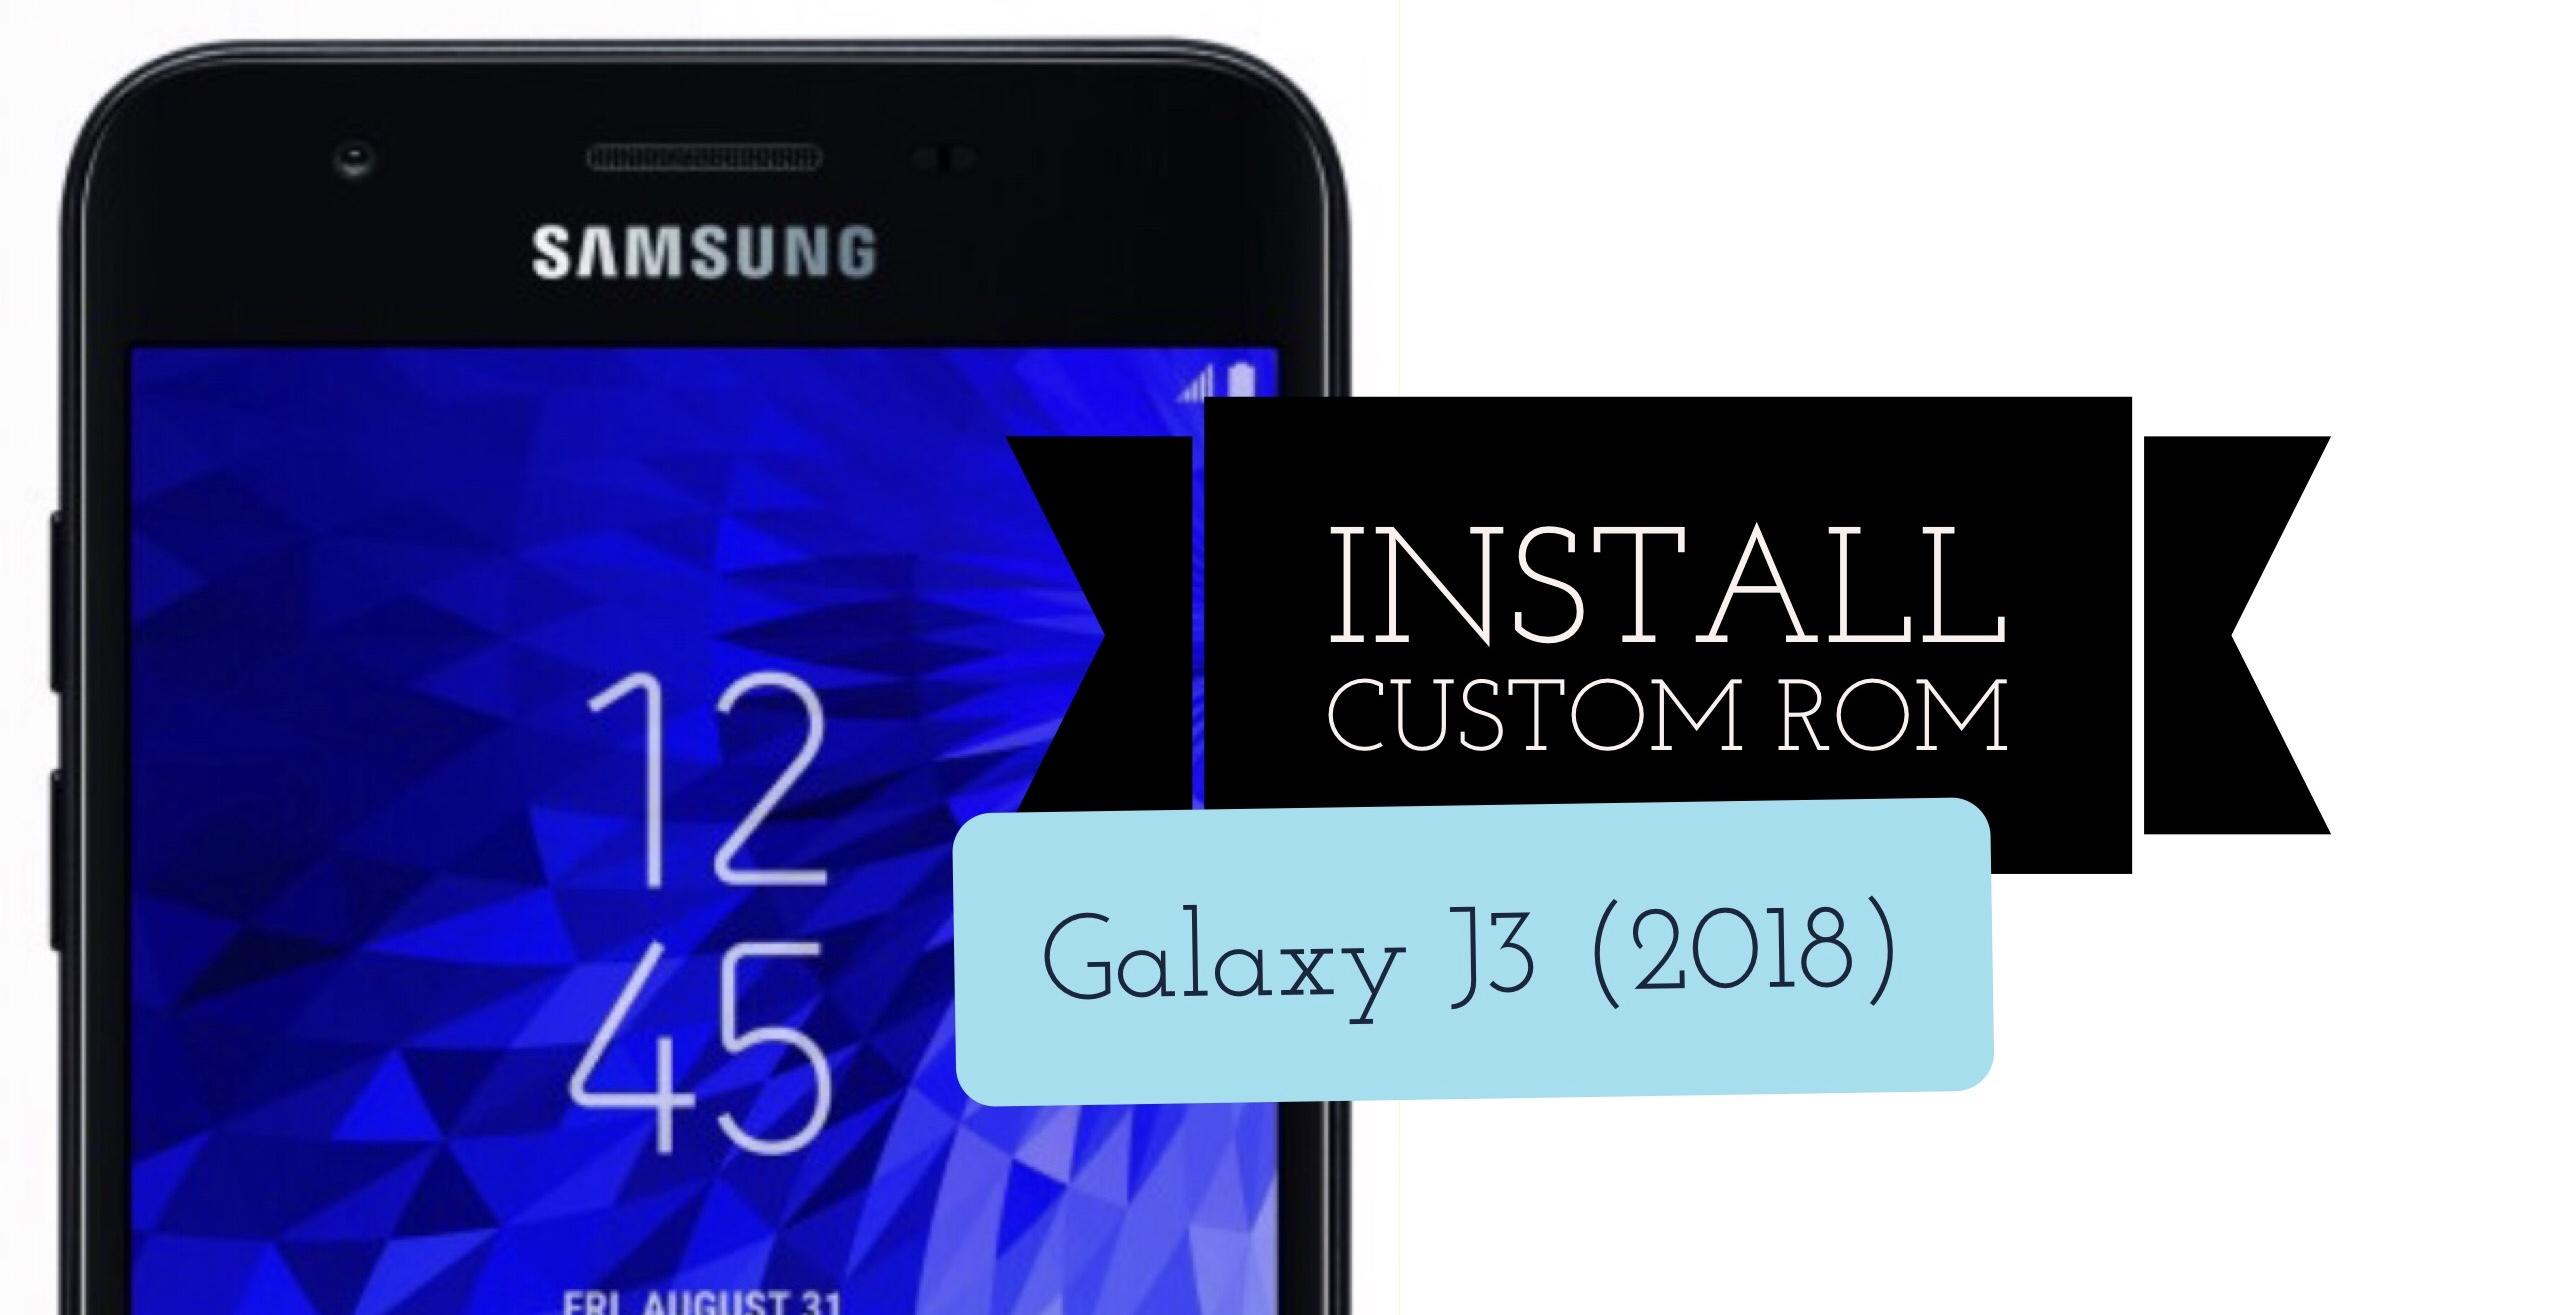 How to Install Custom Rom on Galaxy J3 (2018): TWRP & CWM